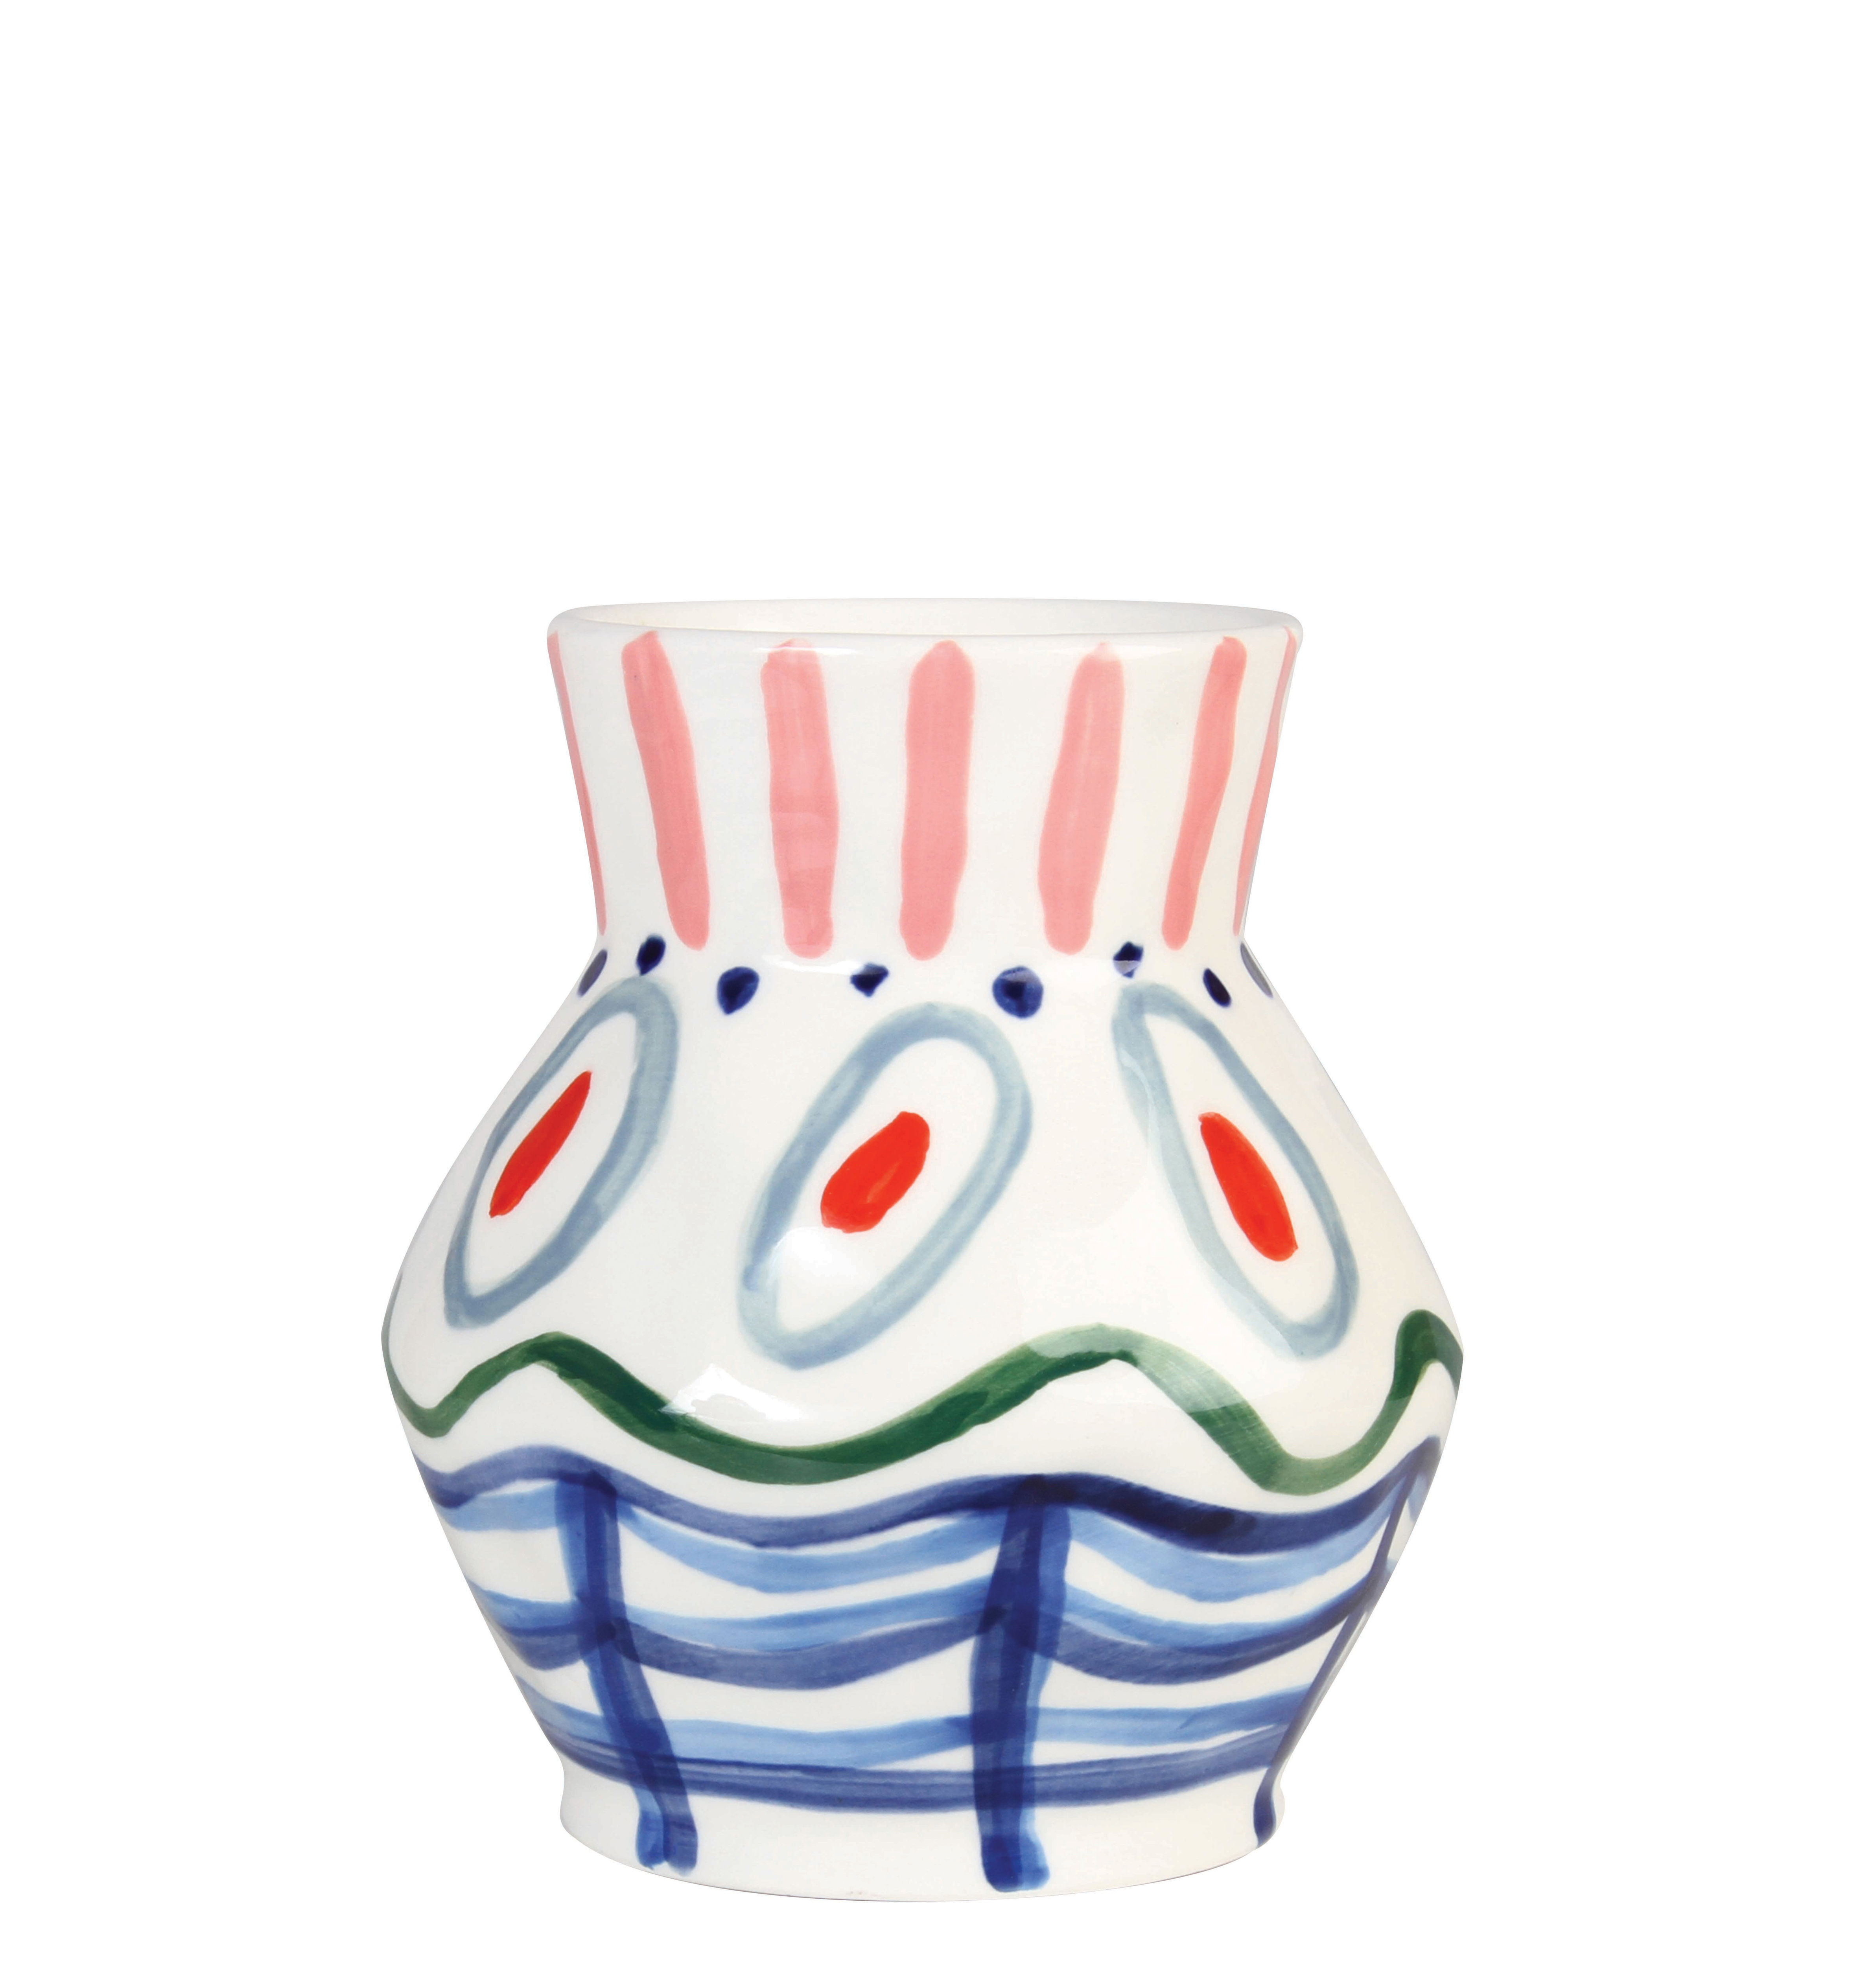 Decoration - Vases - Vase Dalil Vase - / Hand-painted by & klevering - Dalili / Multicoloured - Ceramic